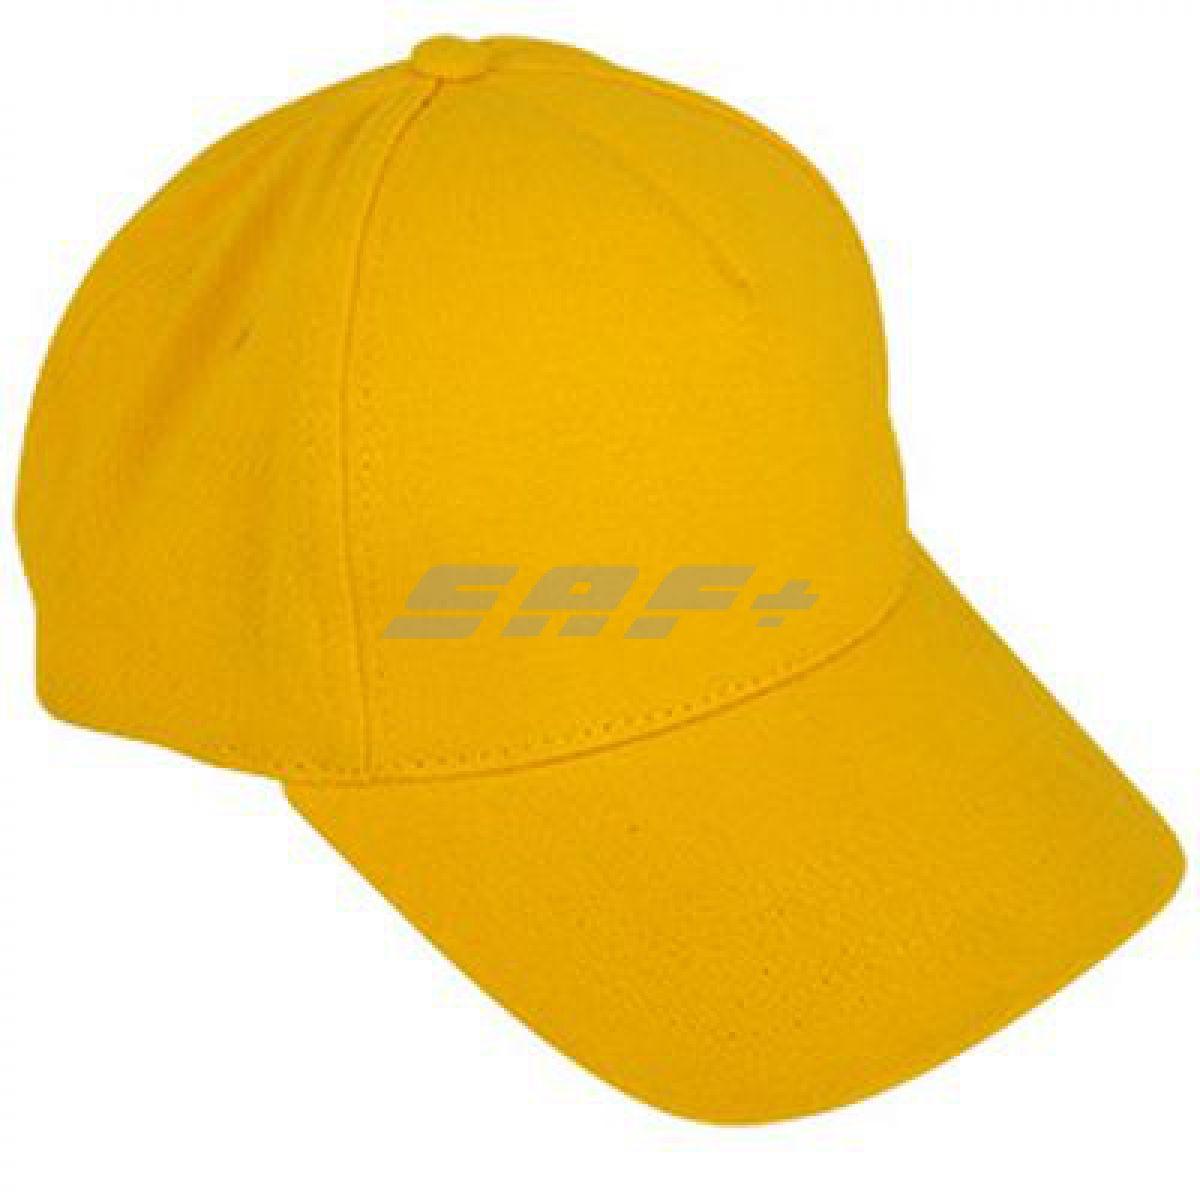 Бейсболка жёлтая (полувелюр)